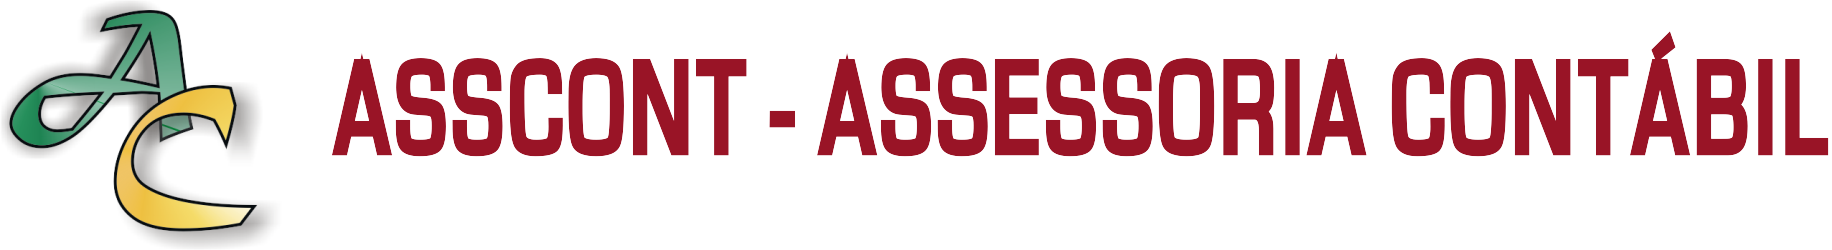 ASSCONT - ASSESSORIA CONTÁBIL